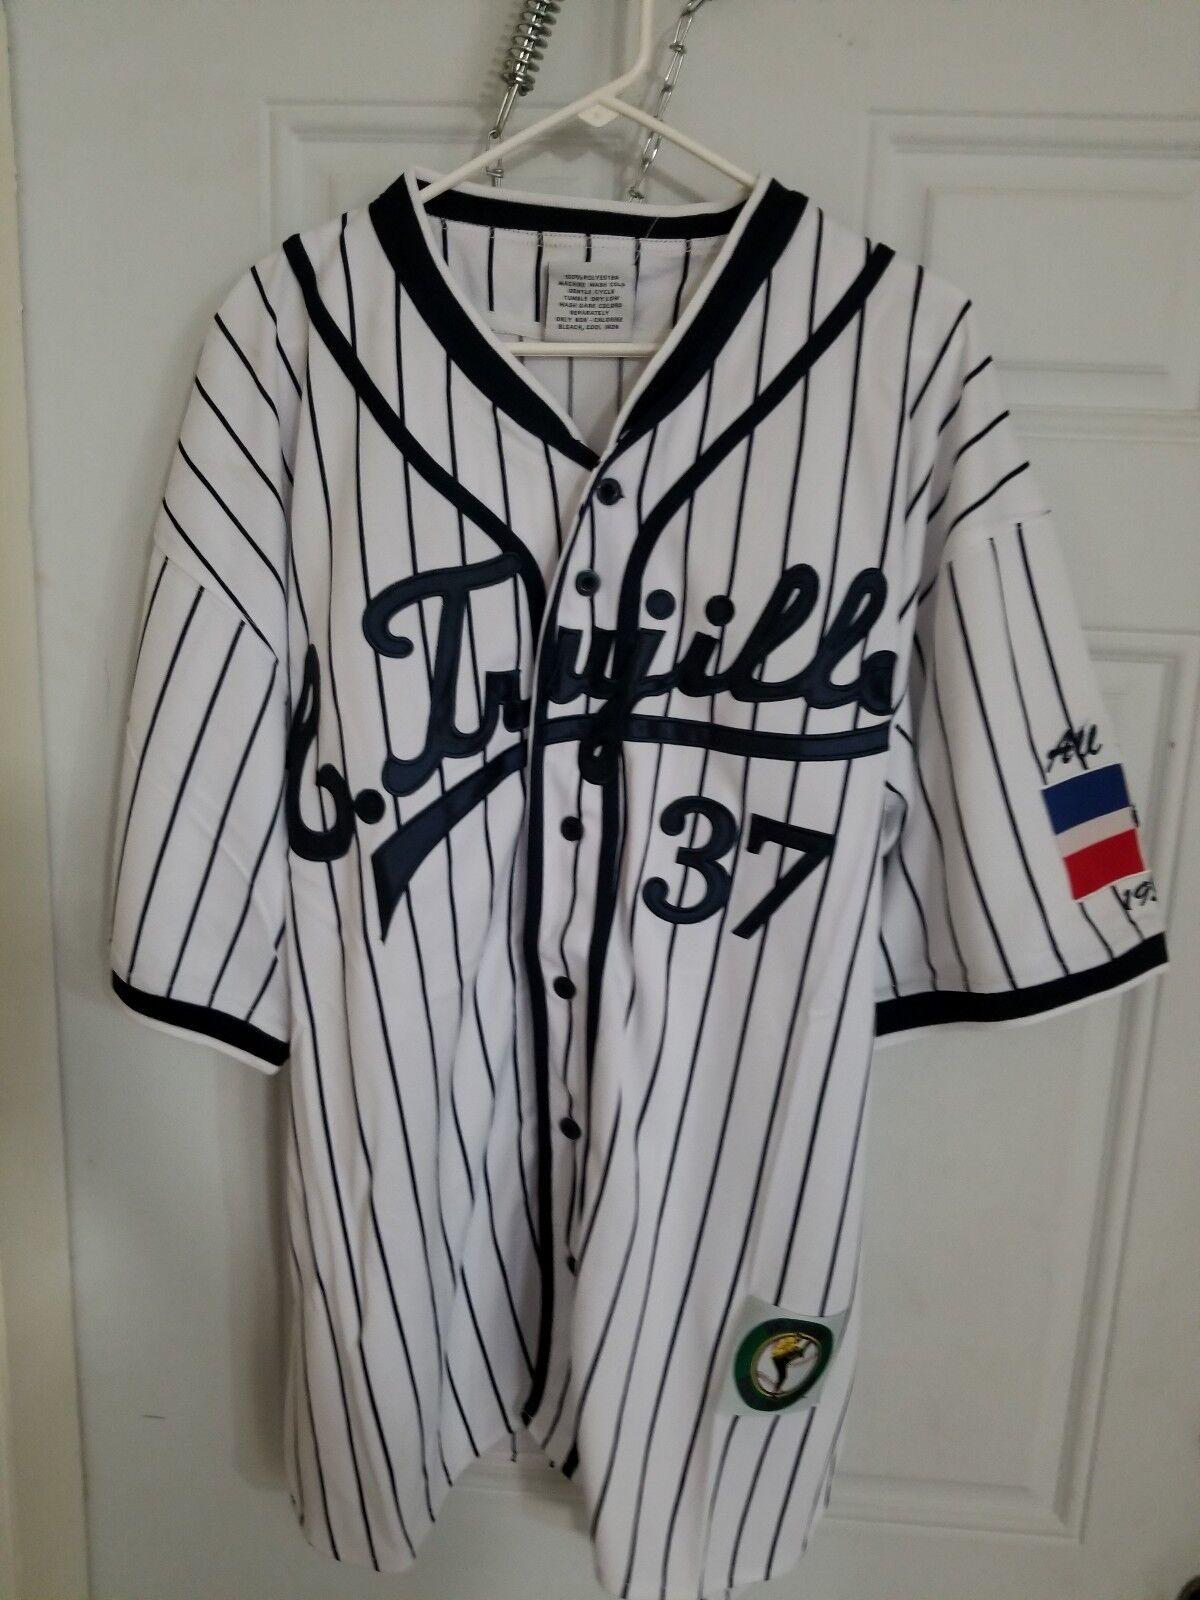 L. Trujillo  37 Baseball Jersey Dominican Vintage Latin League Größe L w Tags